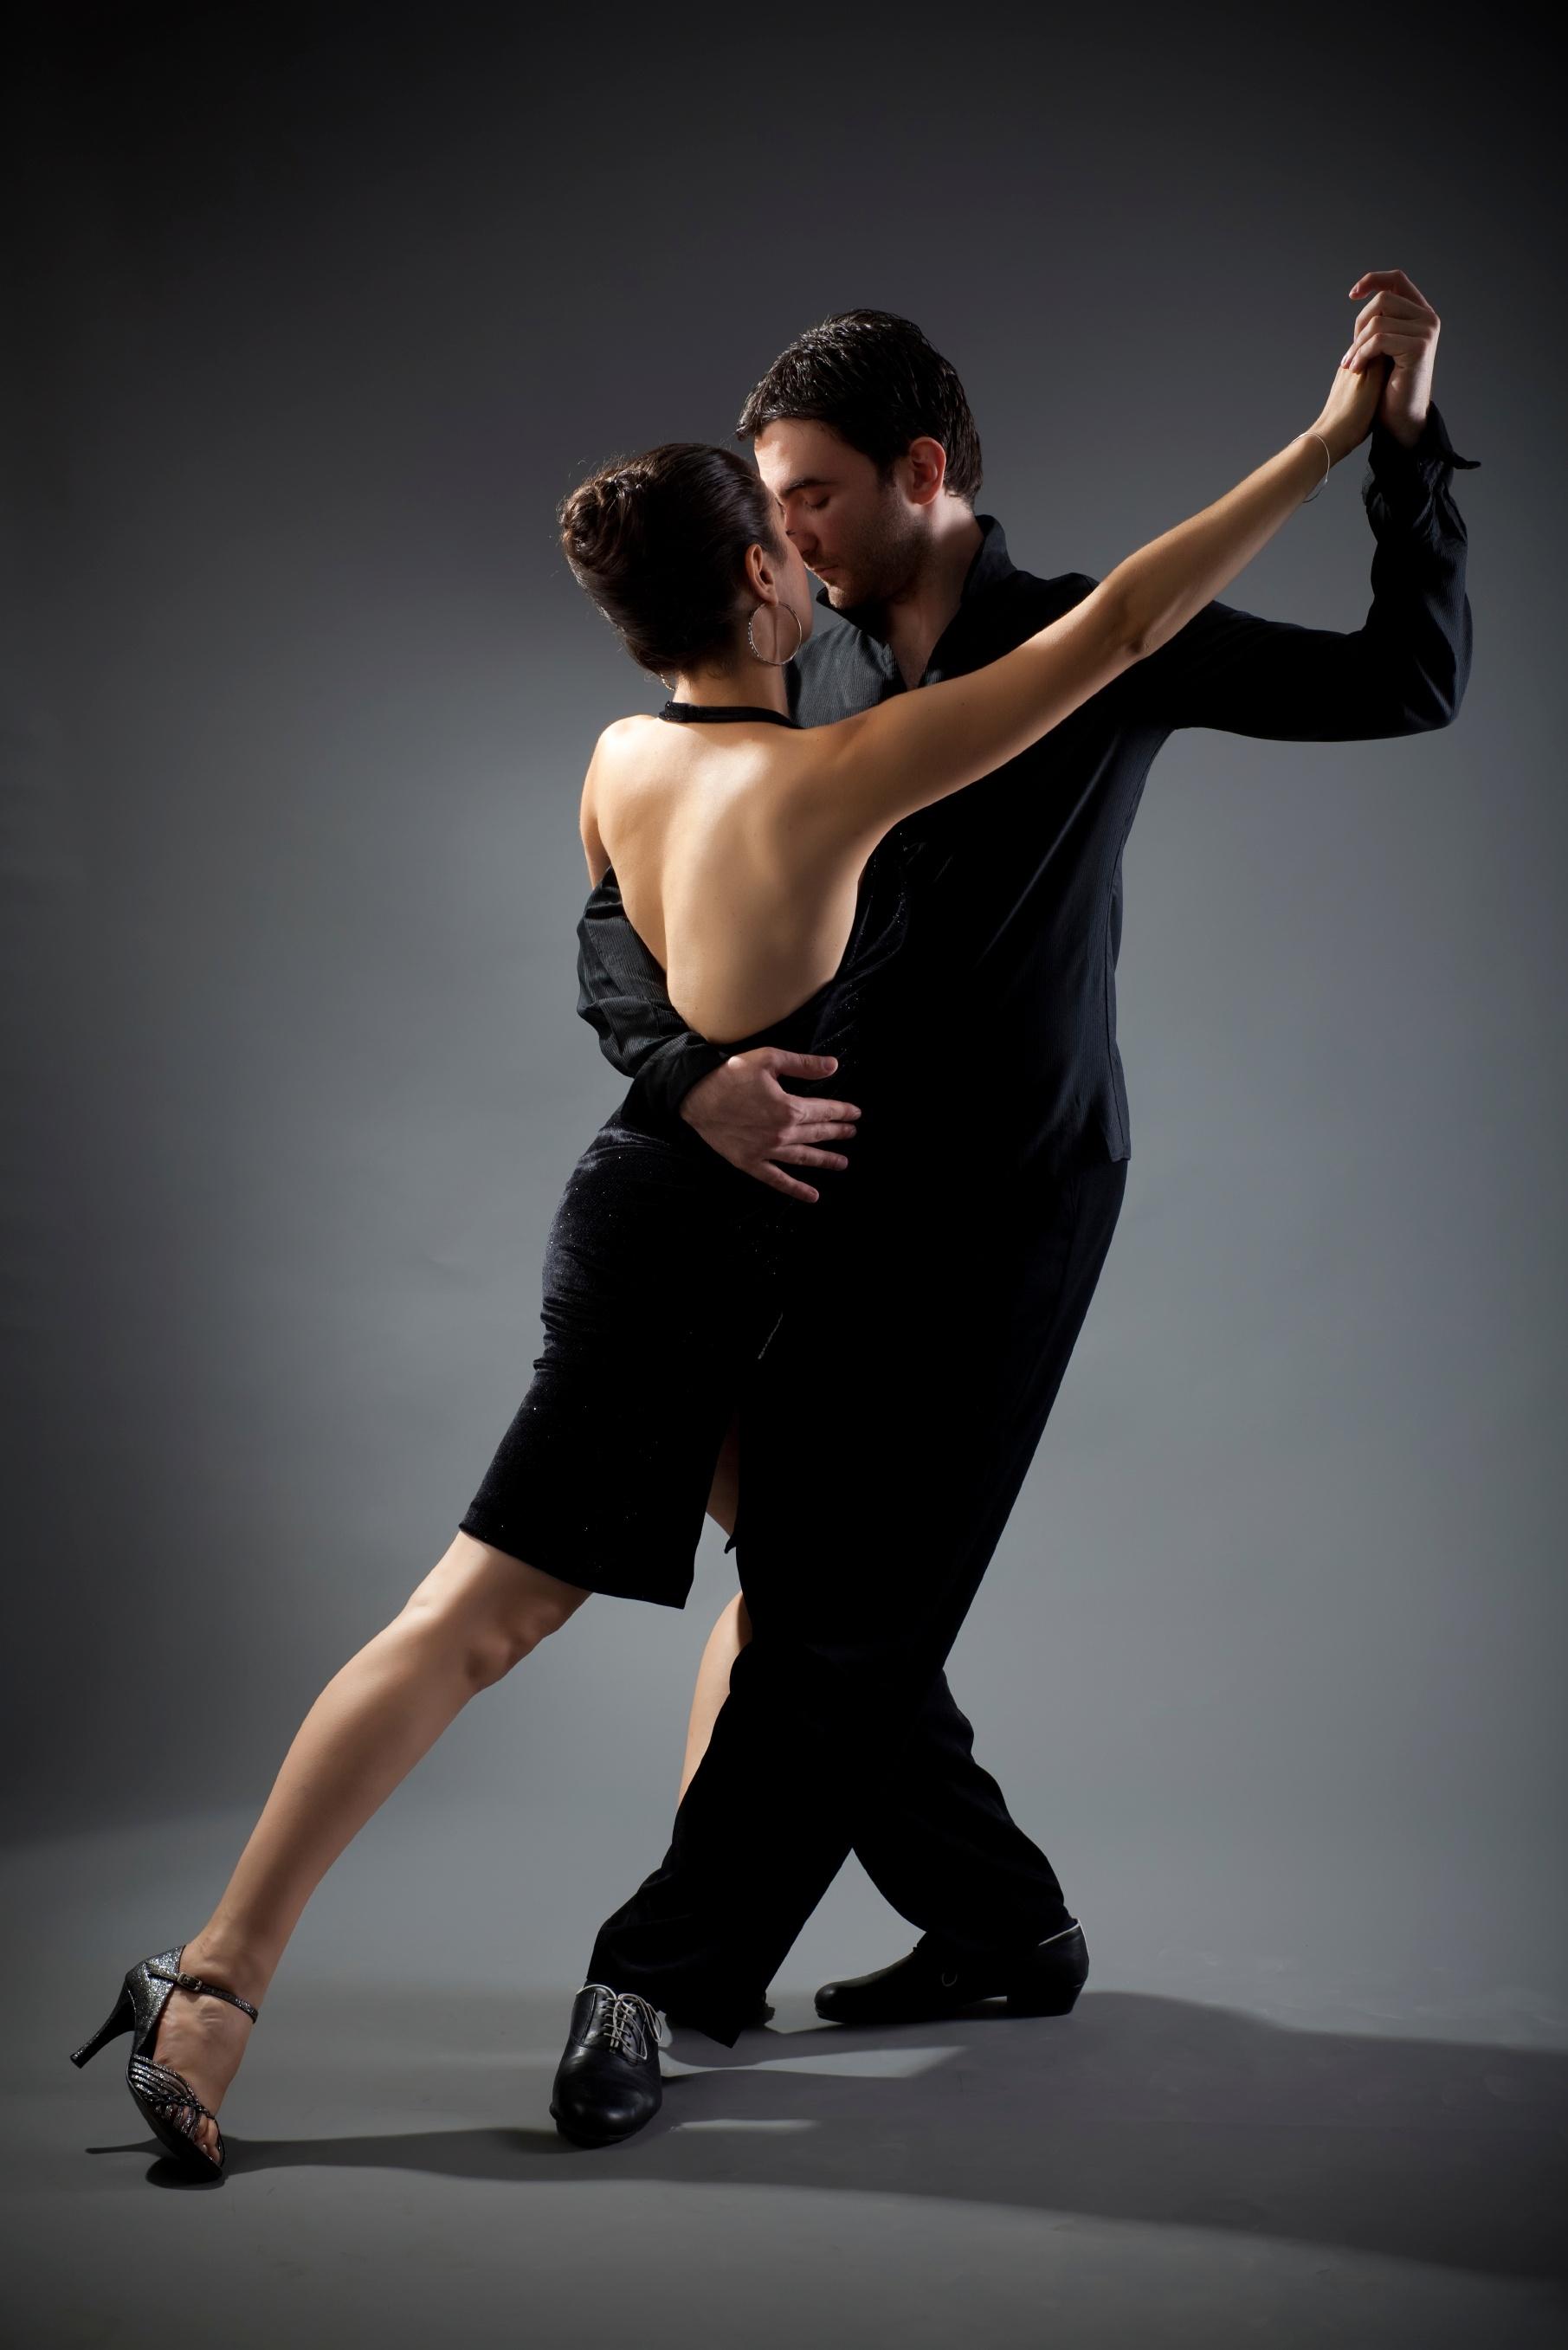 Tango-couple-dancing-000014371299_Large.jpg